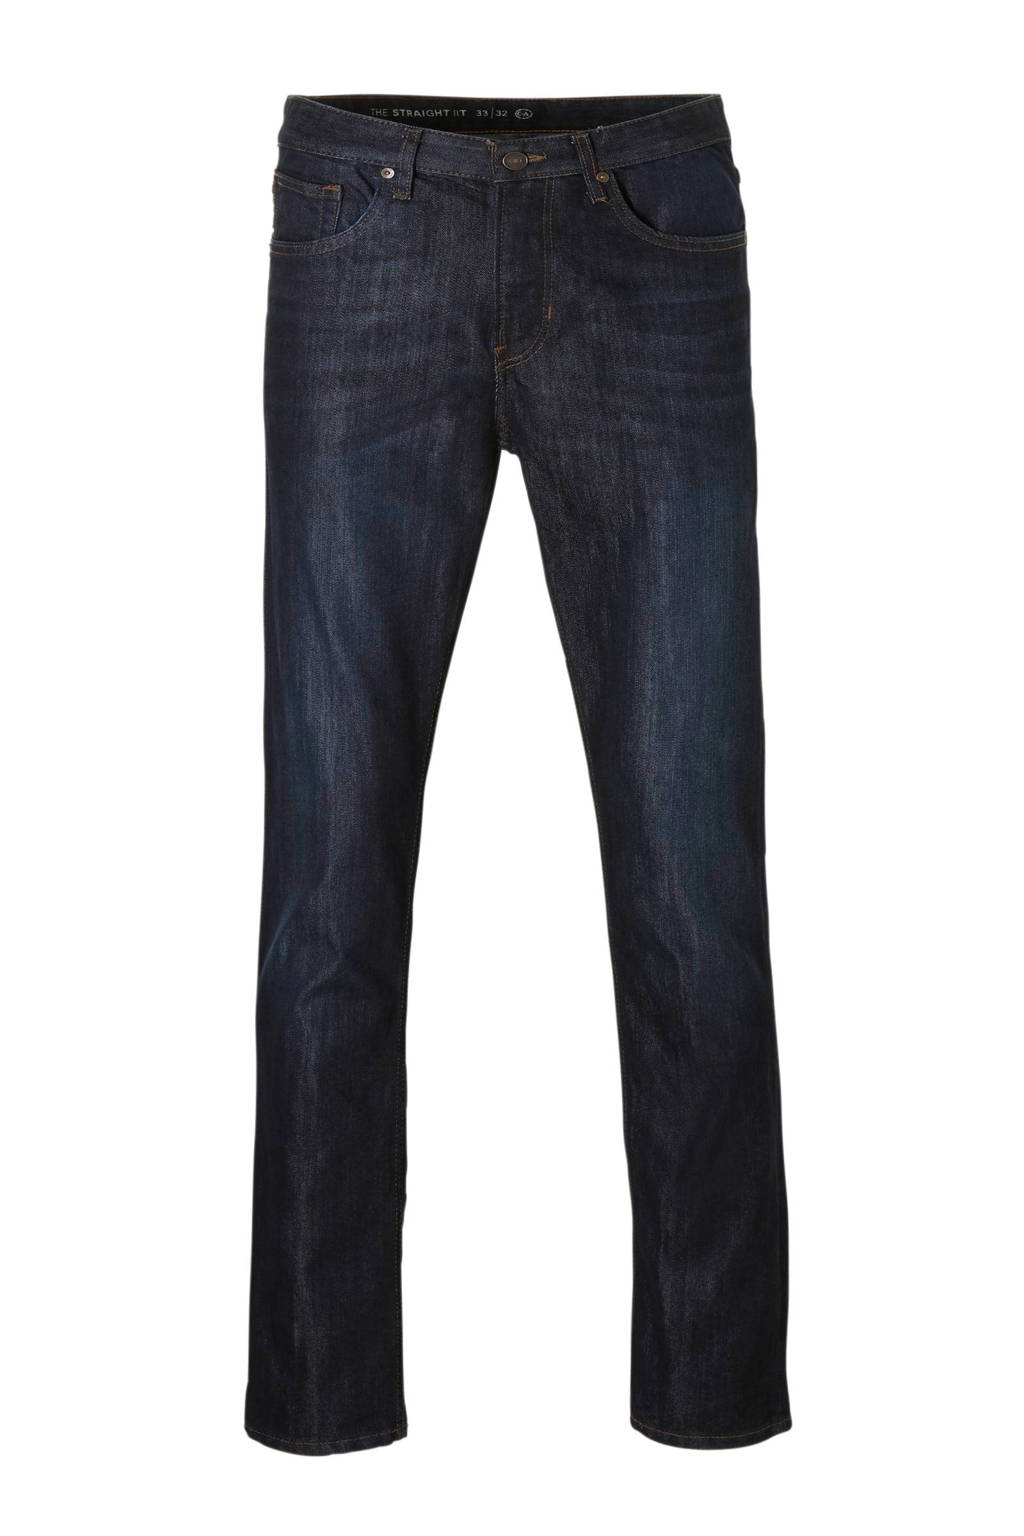 C&A The Denim straight fit jeans, Dark denim